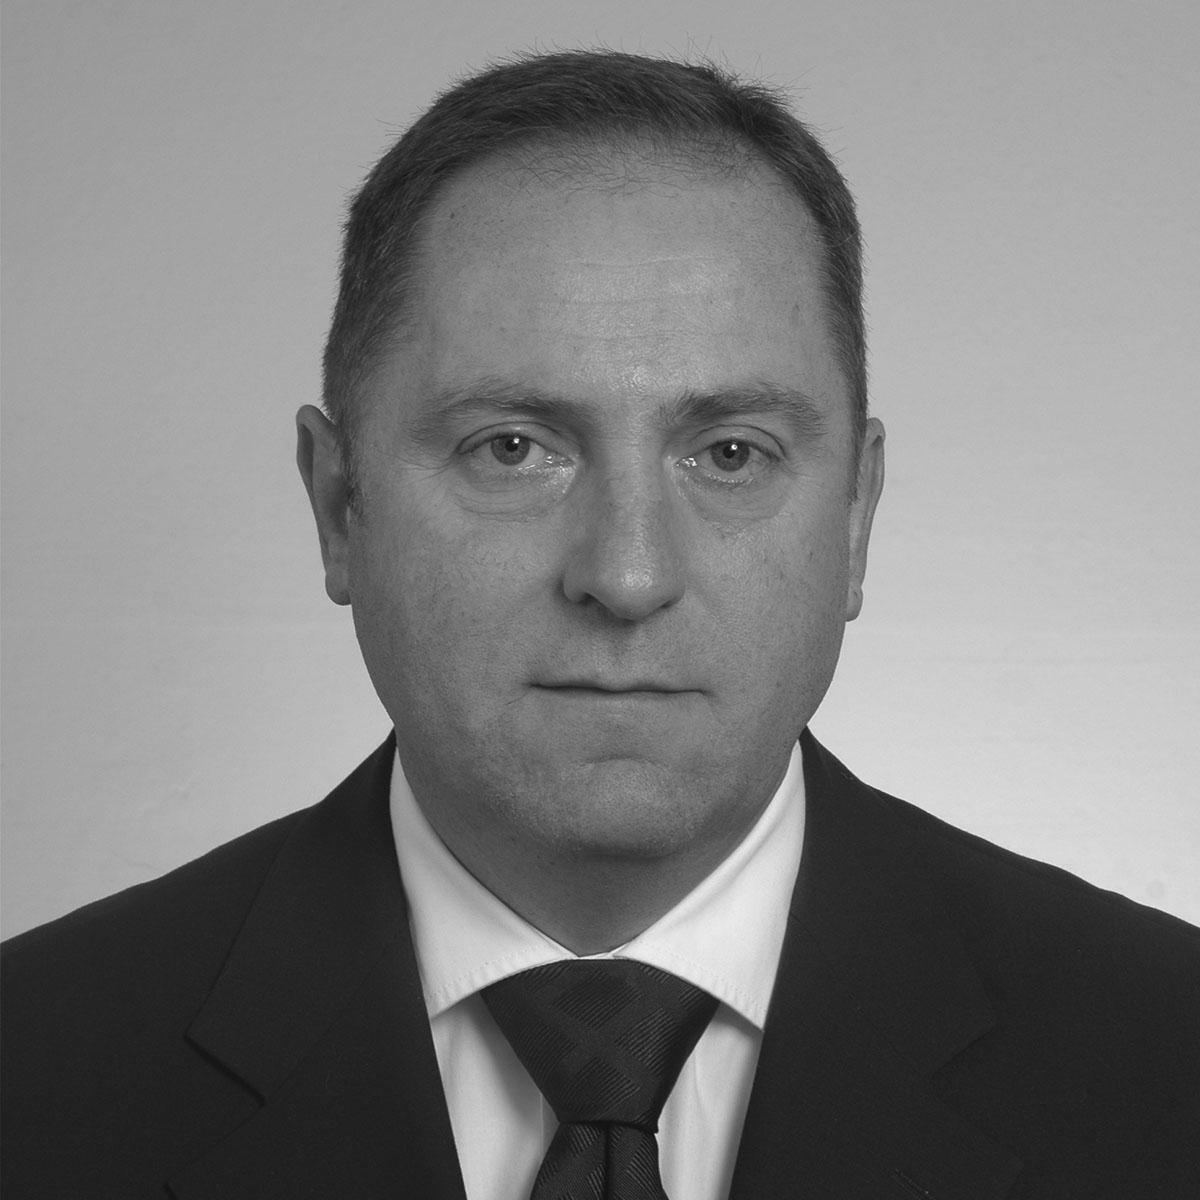 Marjan Petrić